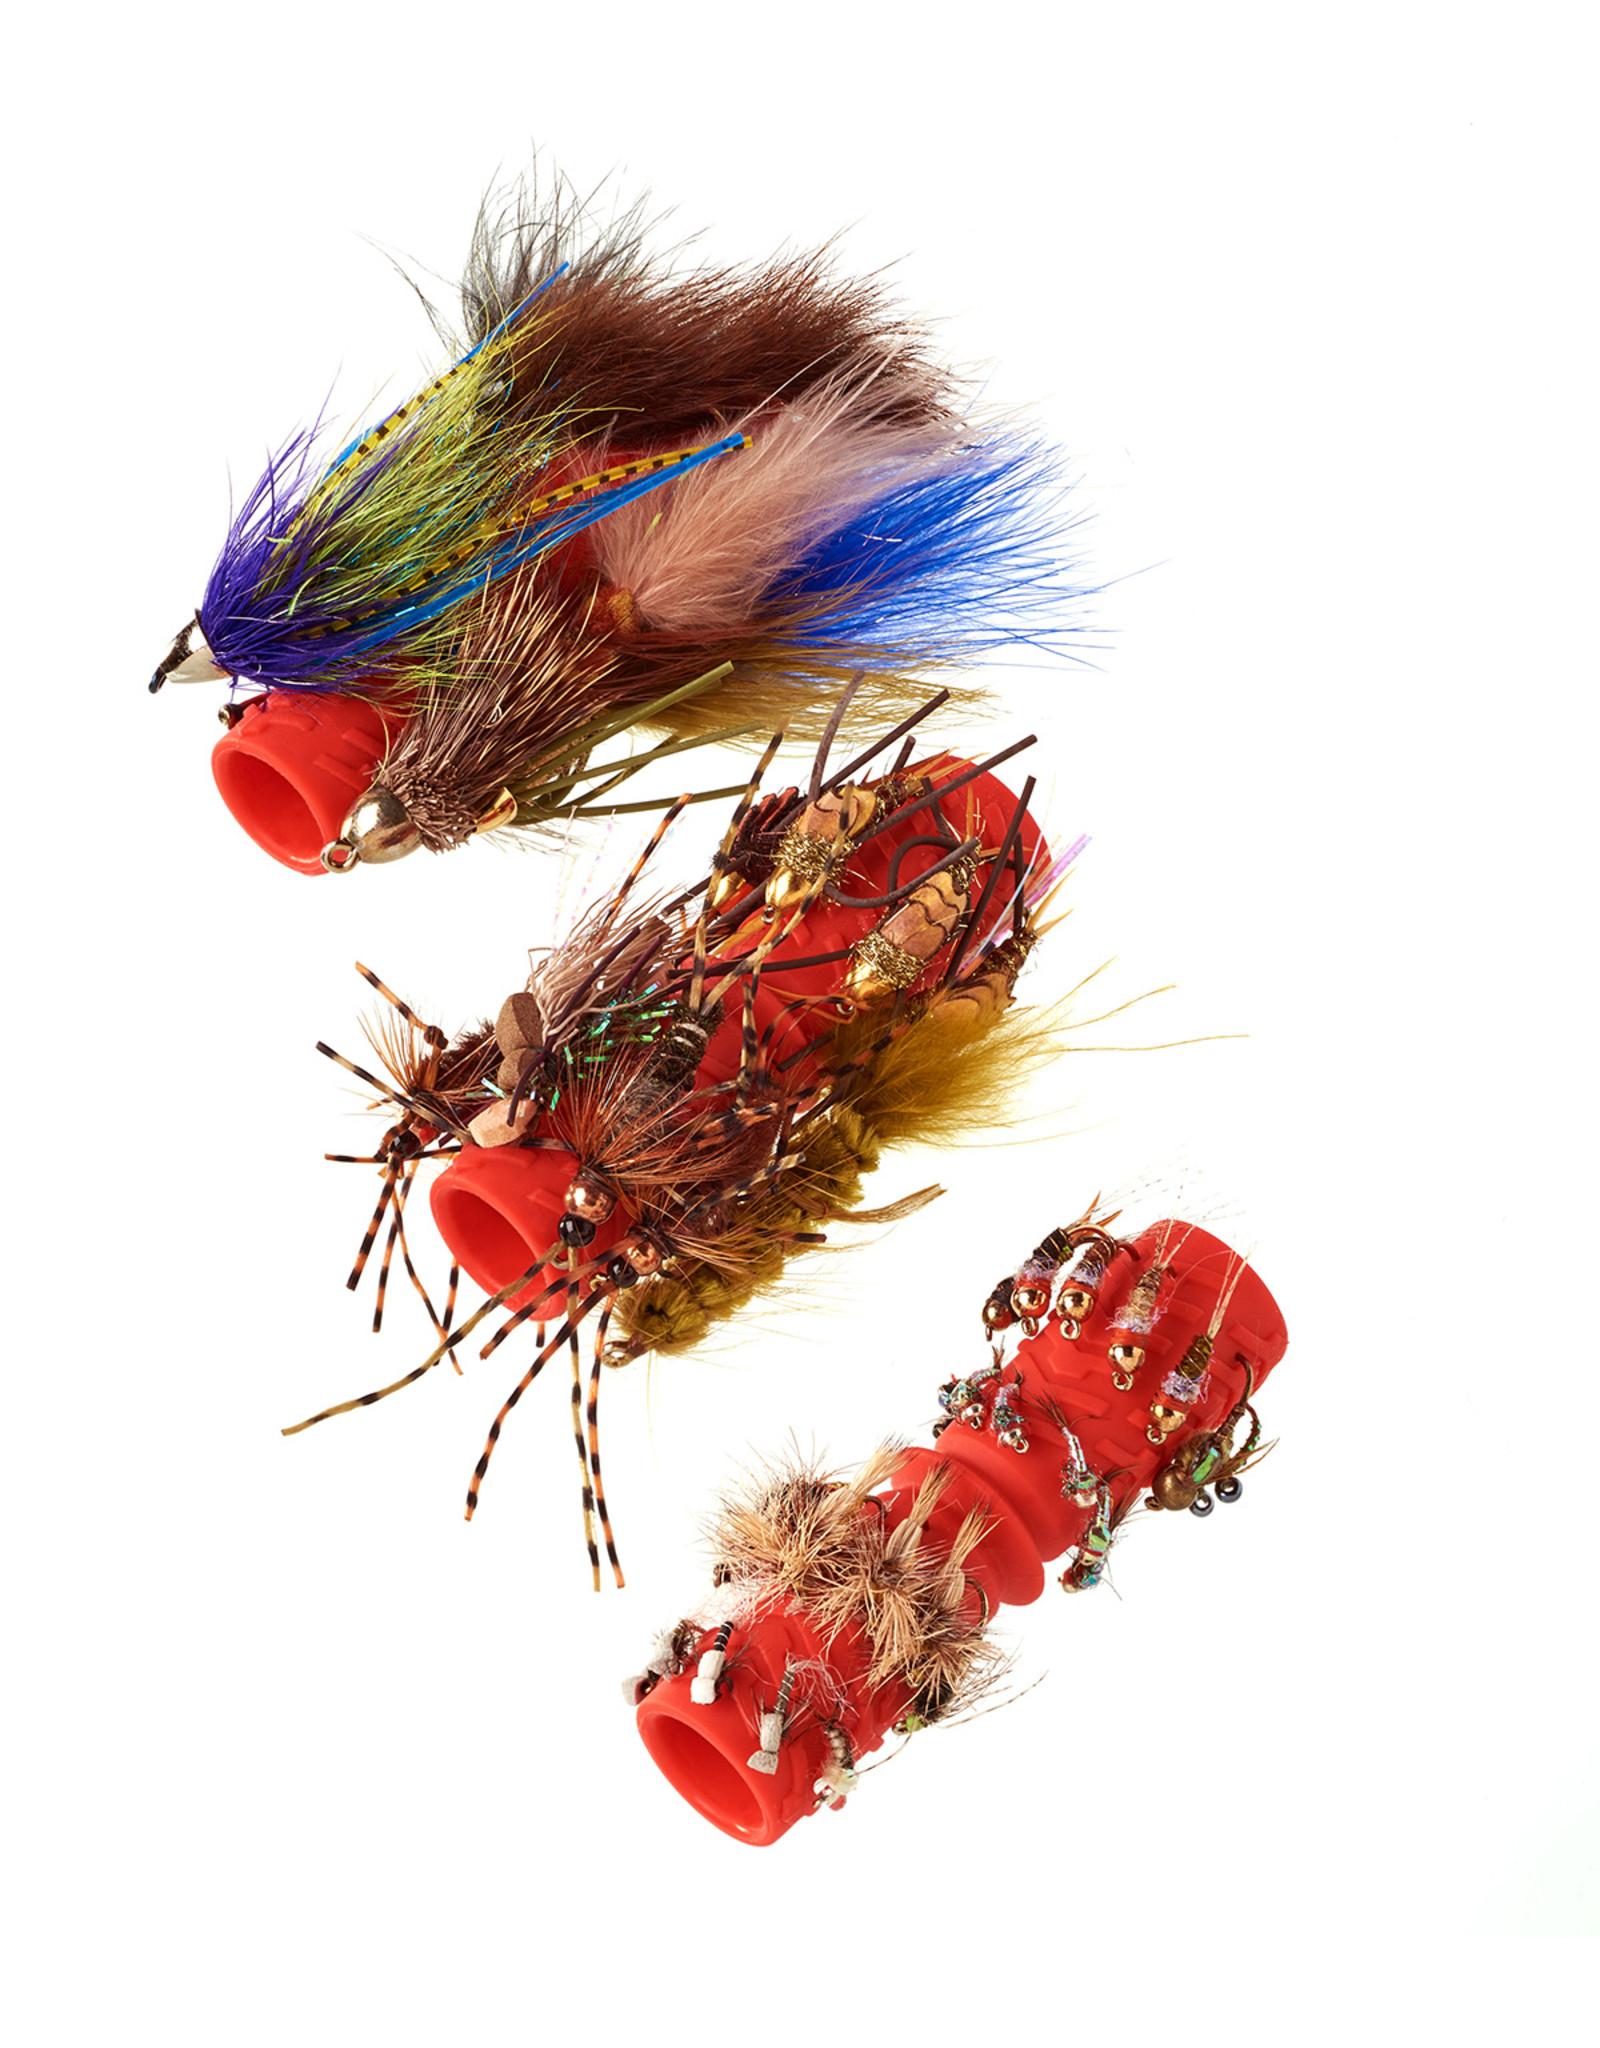 Artisan Angler Artisan Angler - Fly Trap XLT Pro Series